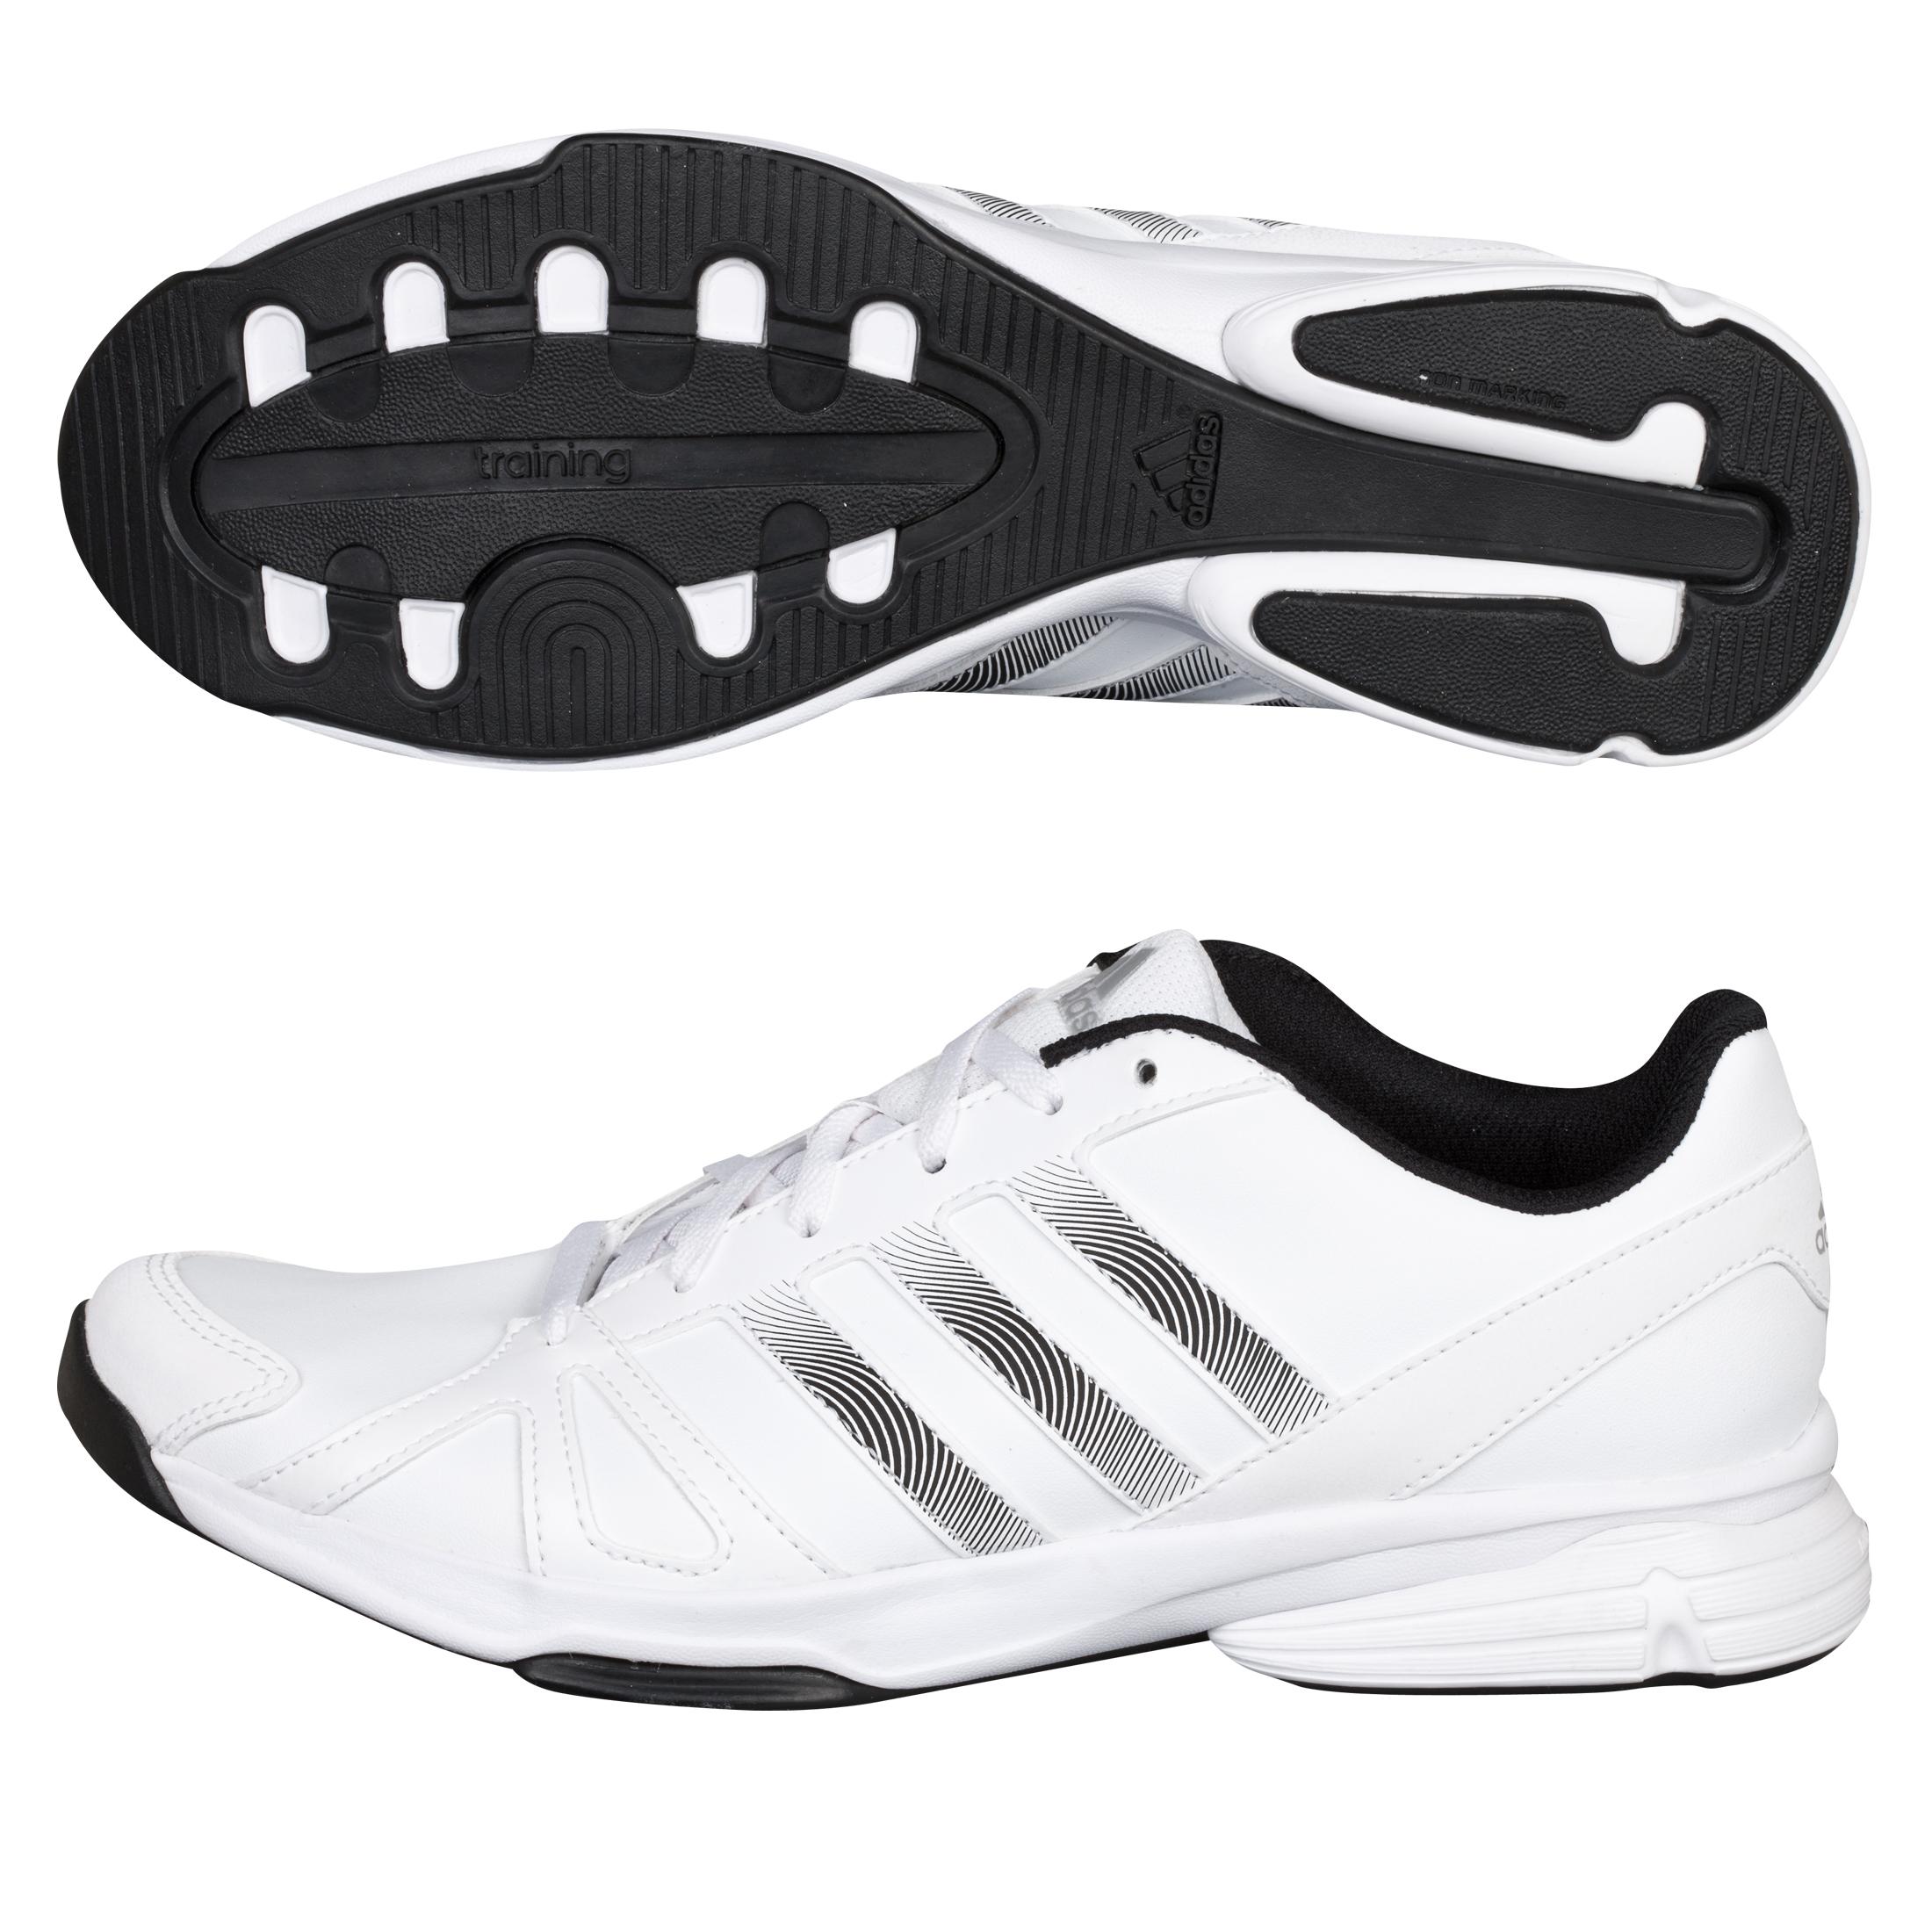 Adidas Sumbrah 2 Trainer - Womens